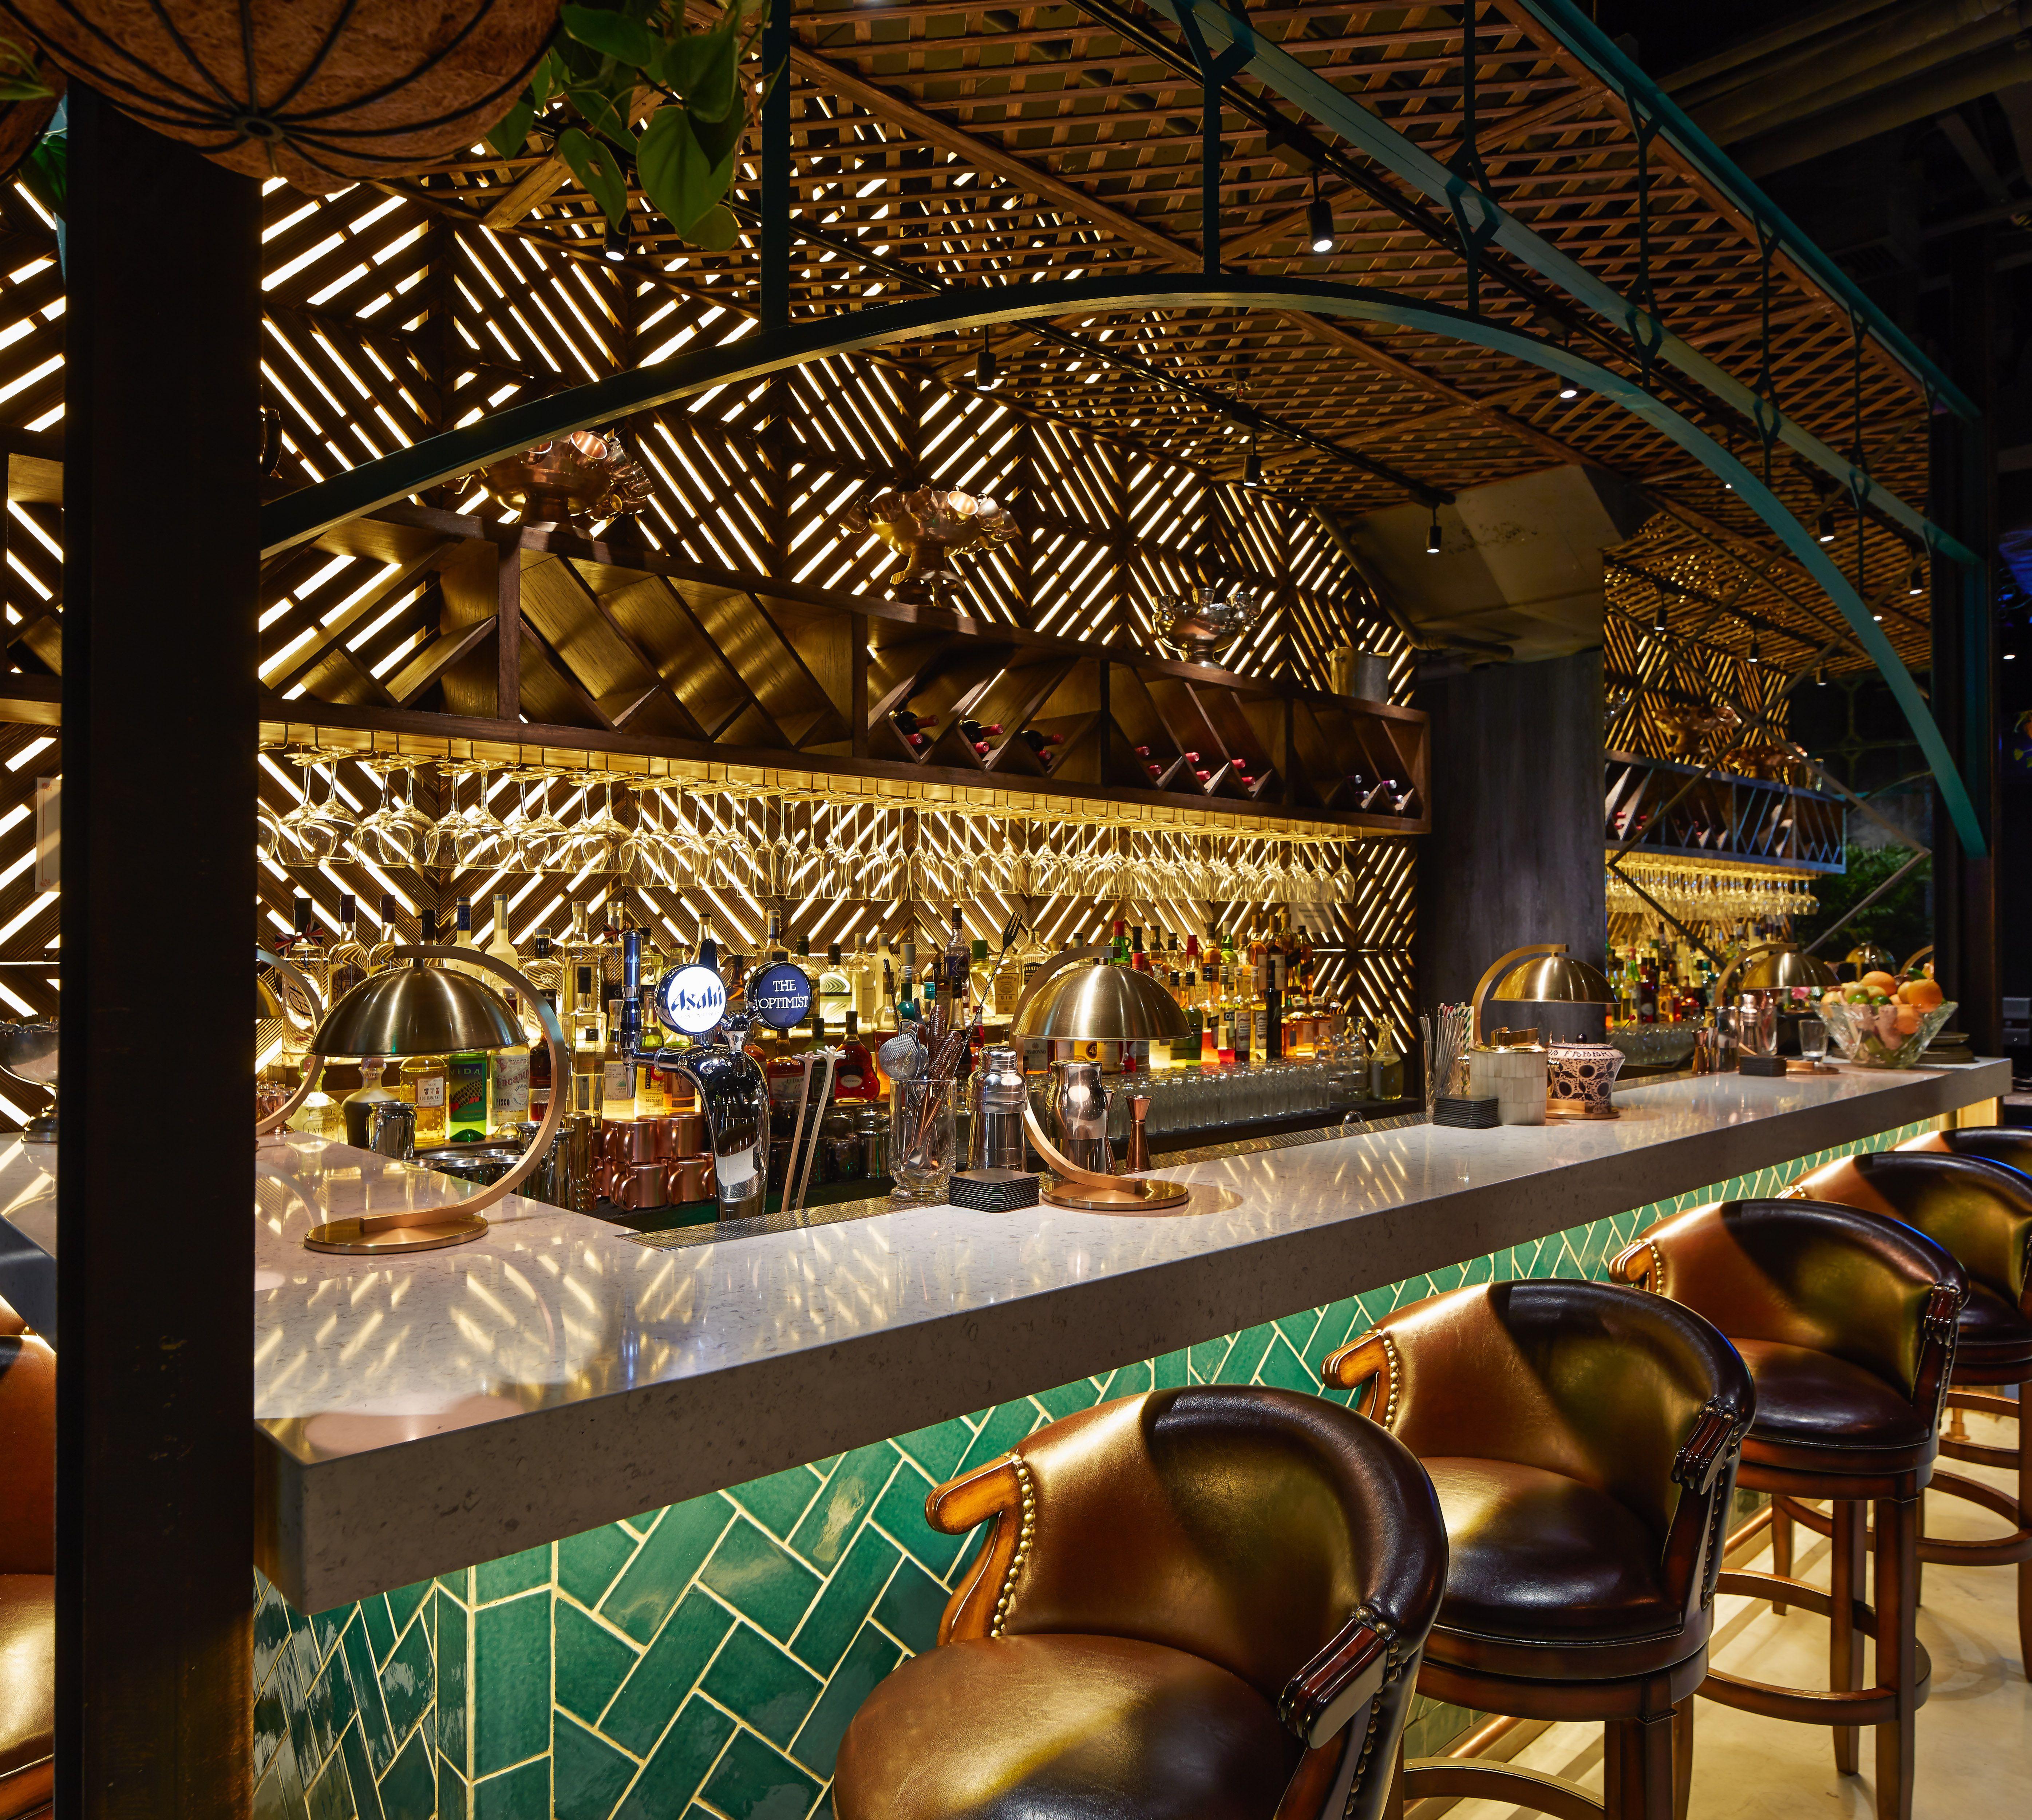 The optimist bar hotel pinterest